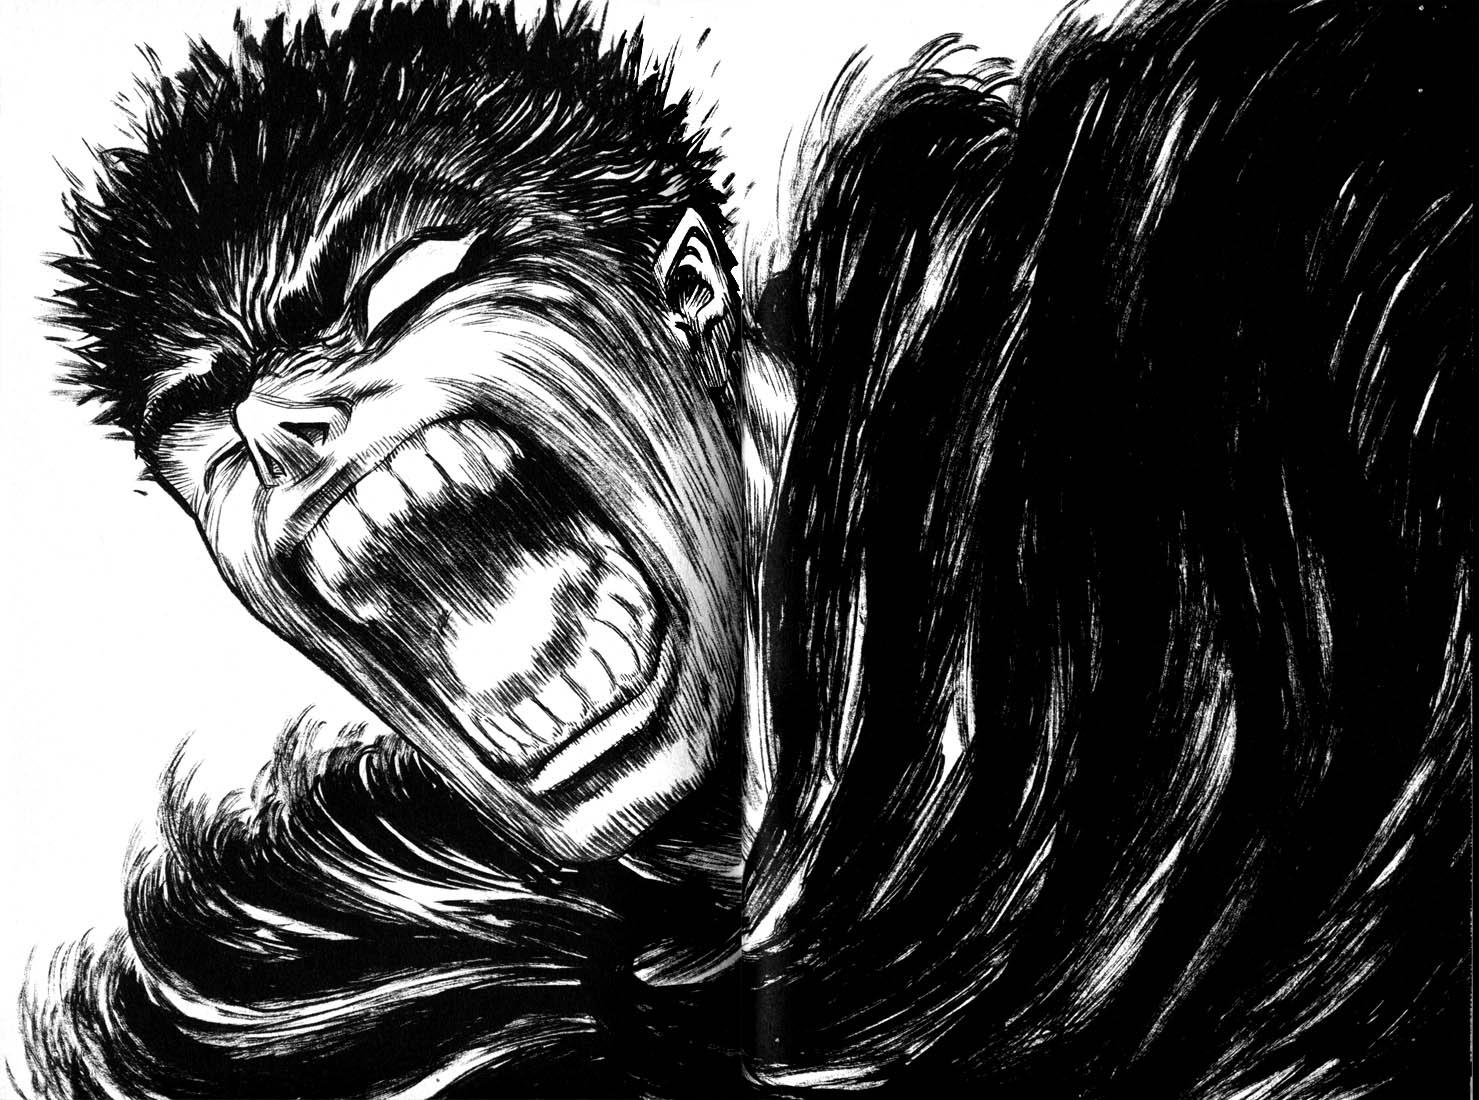 Episode 27 Berserk Manga Part 1 Bonfireside Chatj